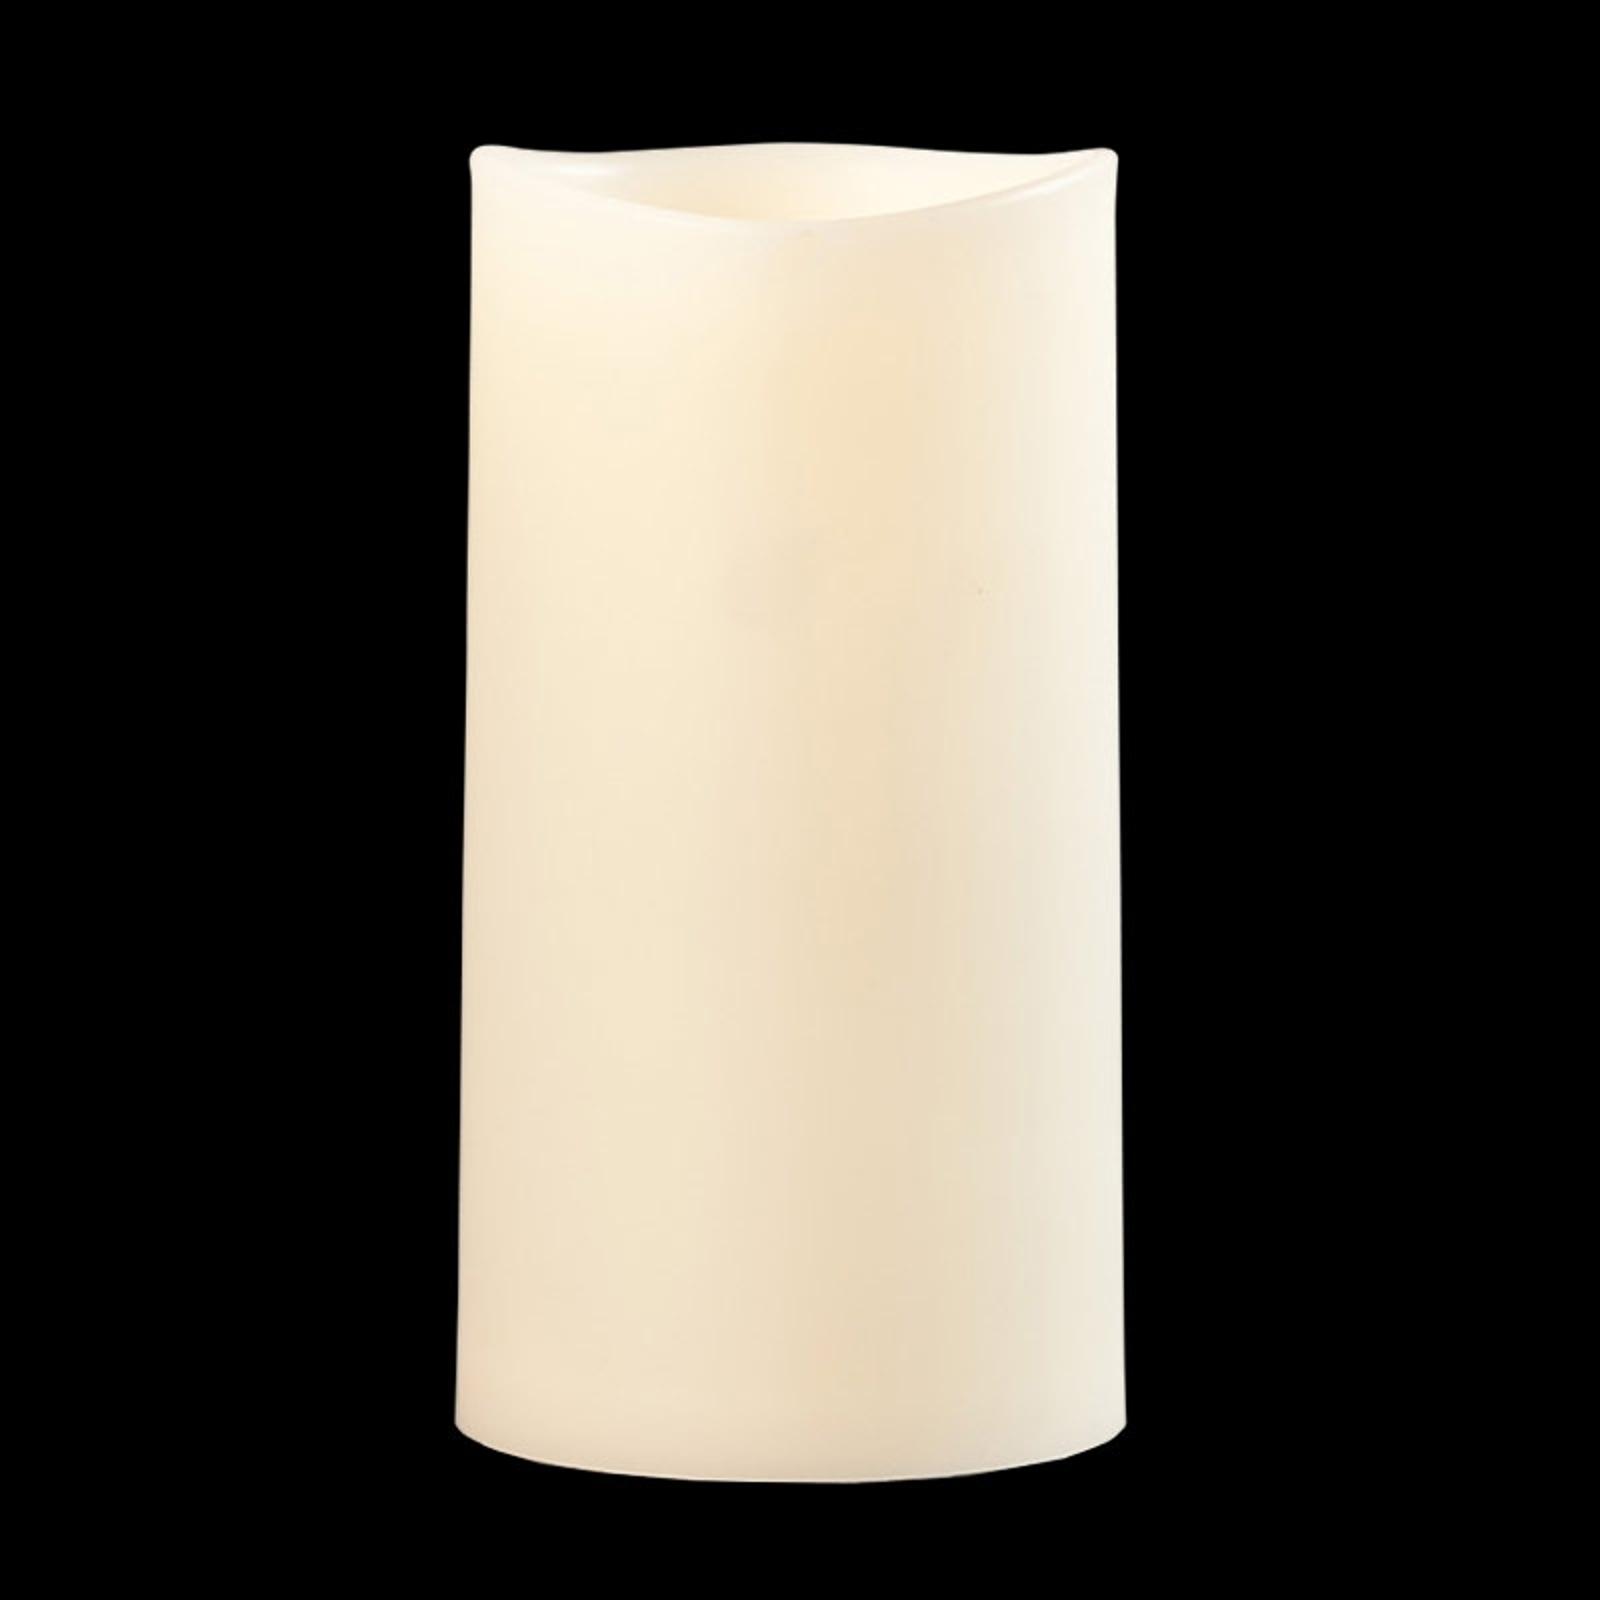 LED-Dekolicht Outdoor Candle 17 cm